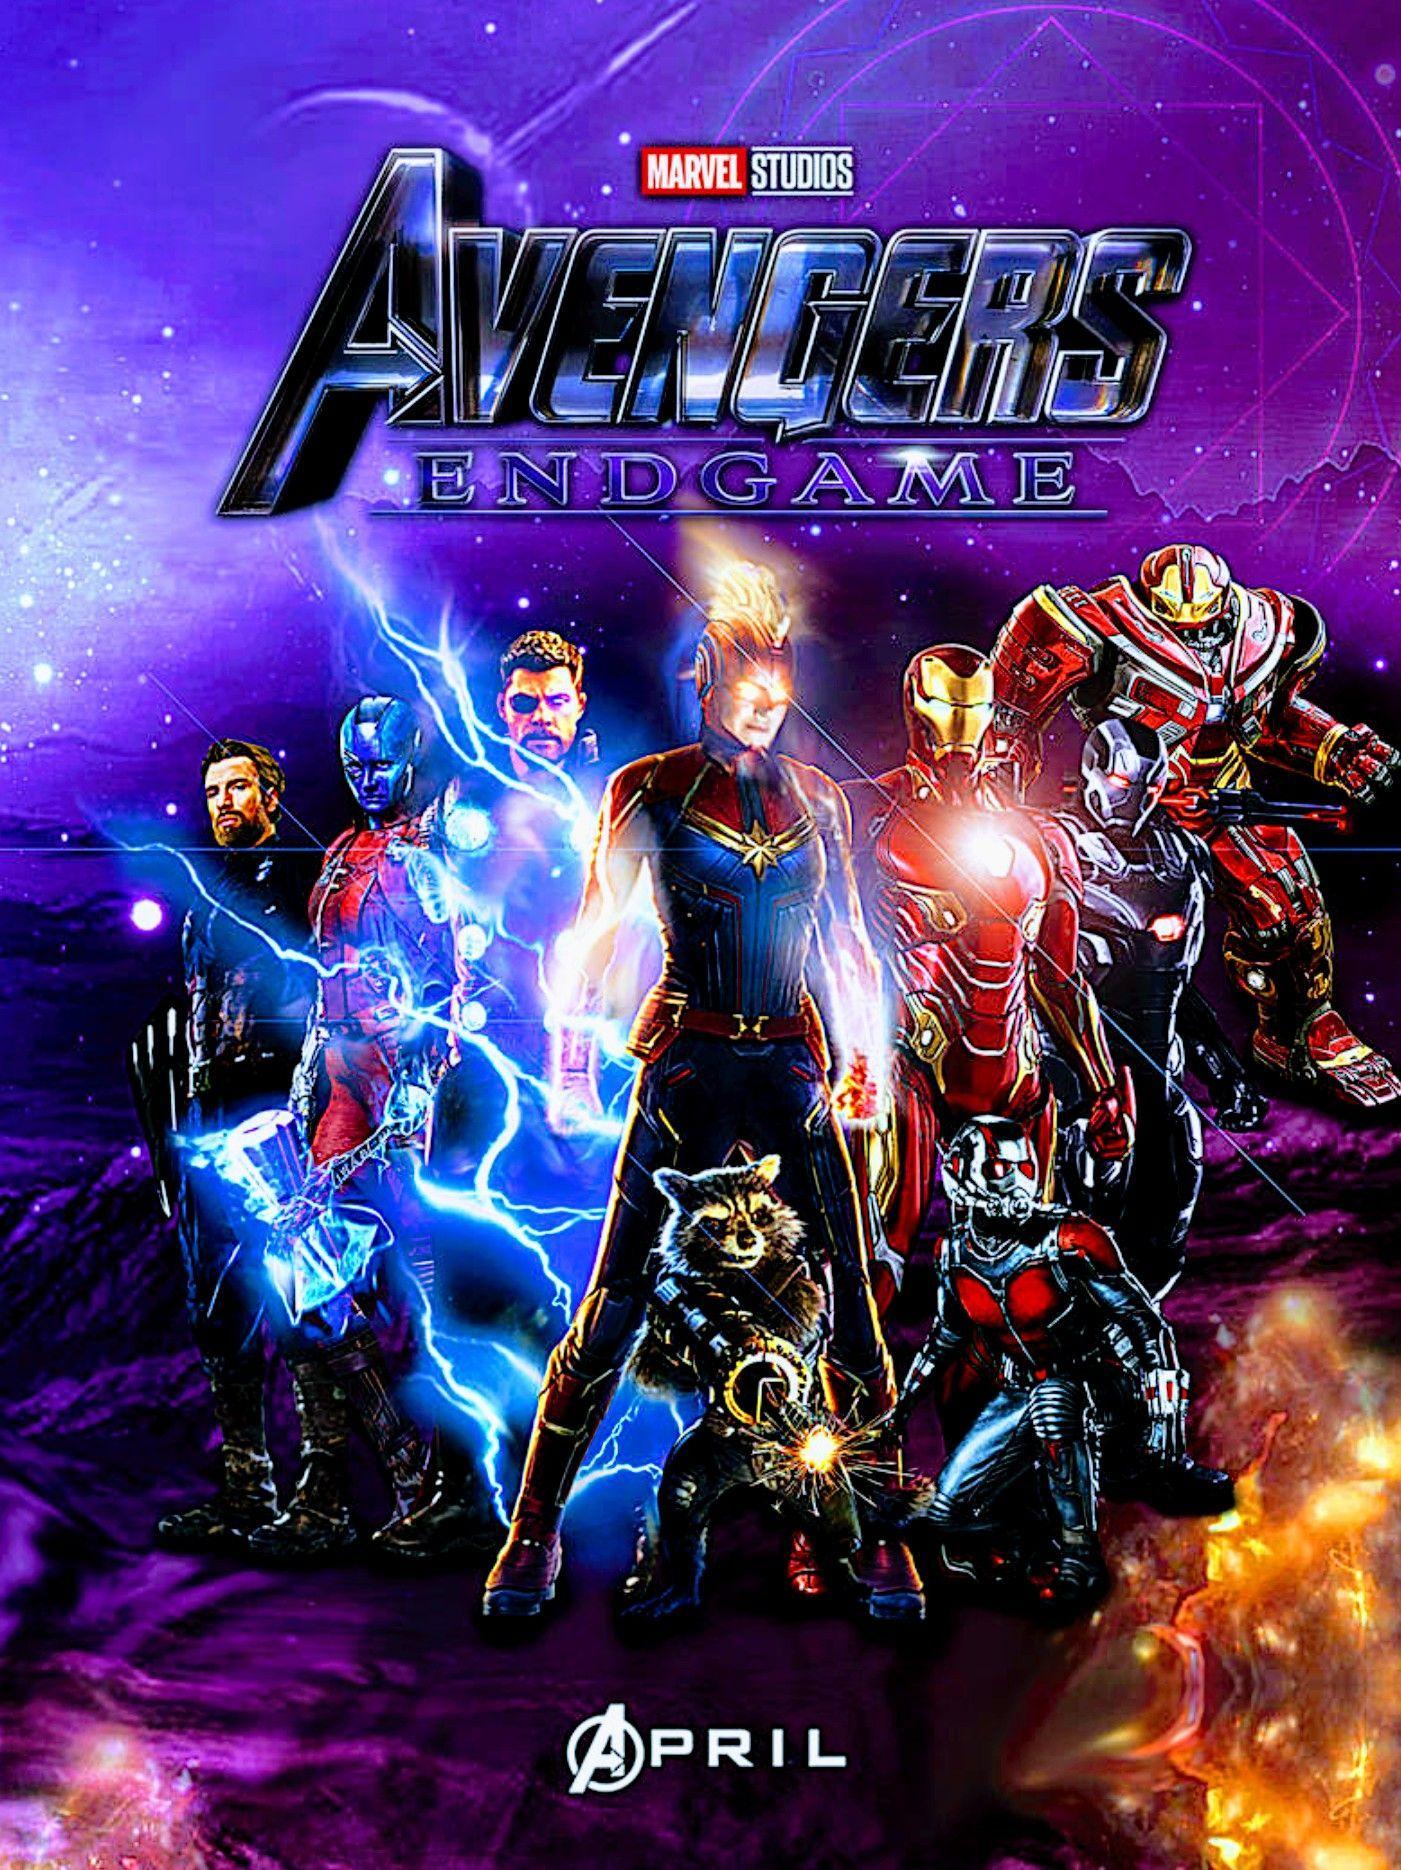 Avenger Endgame Wallpaper Iphone Fb1ad1200dc1955e39ea2bdb14bcd4c5